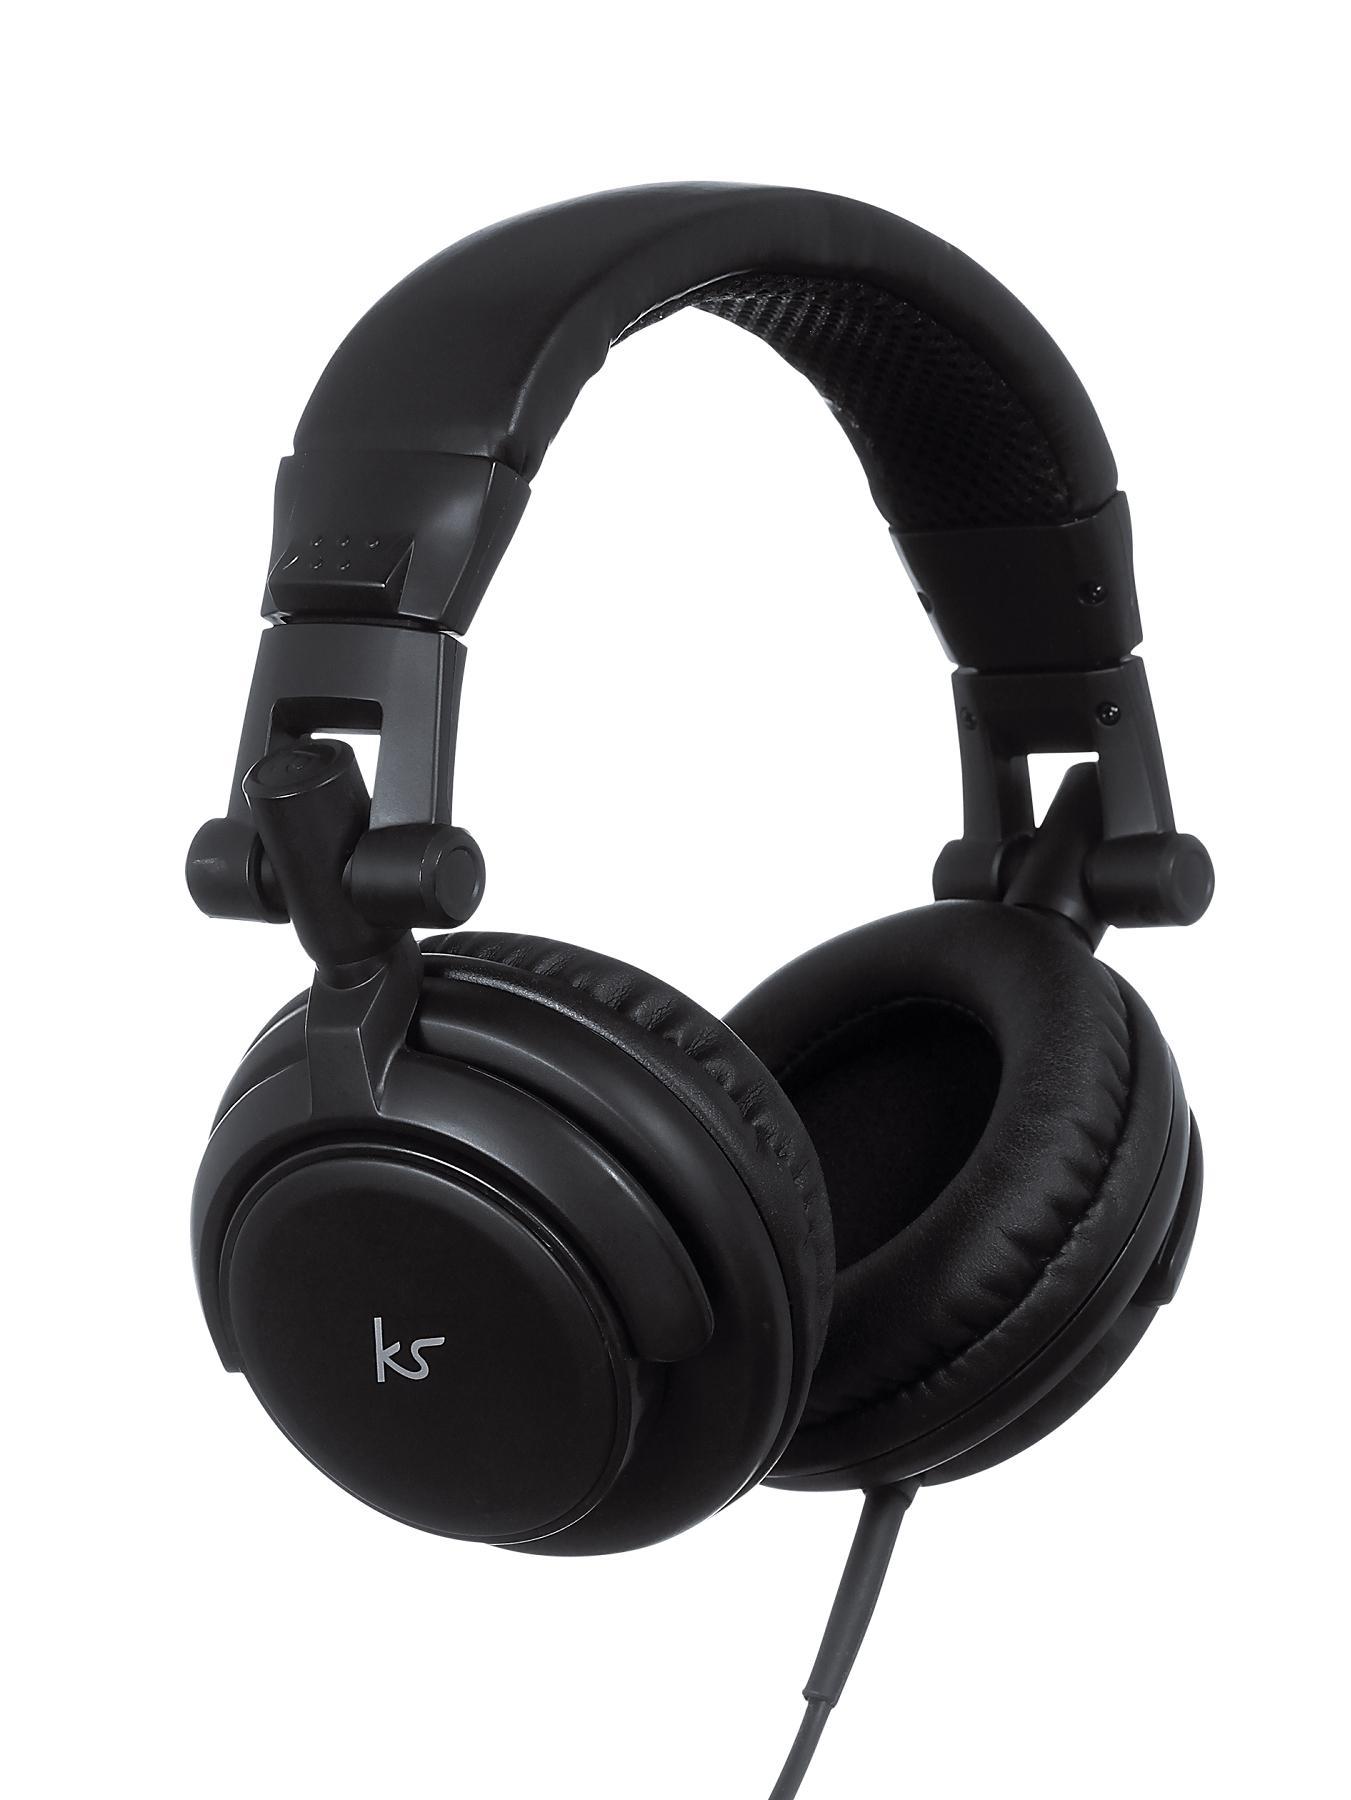 Kitsound DJ Headphones - Black